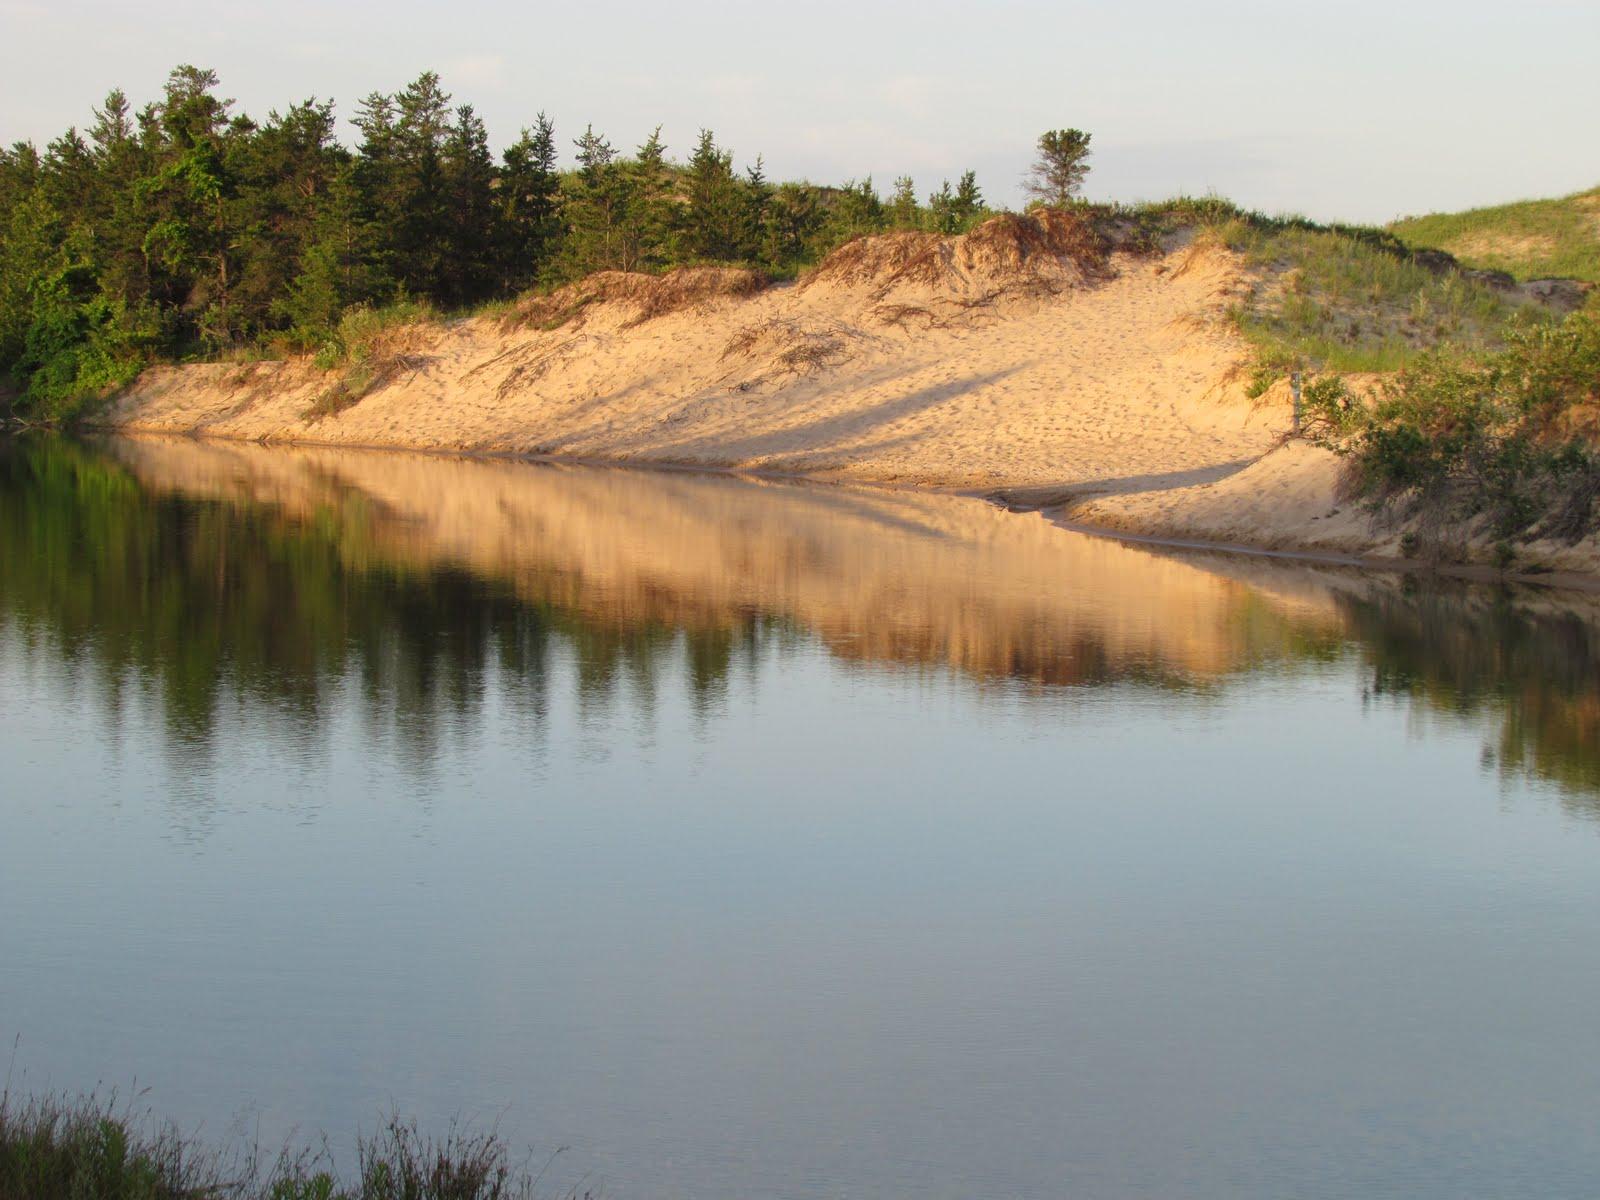 The oakland press blogs earth 39 s almanac july 2011 for Platte river michigan fishing